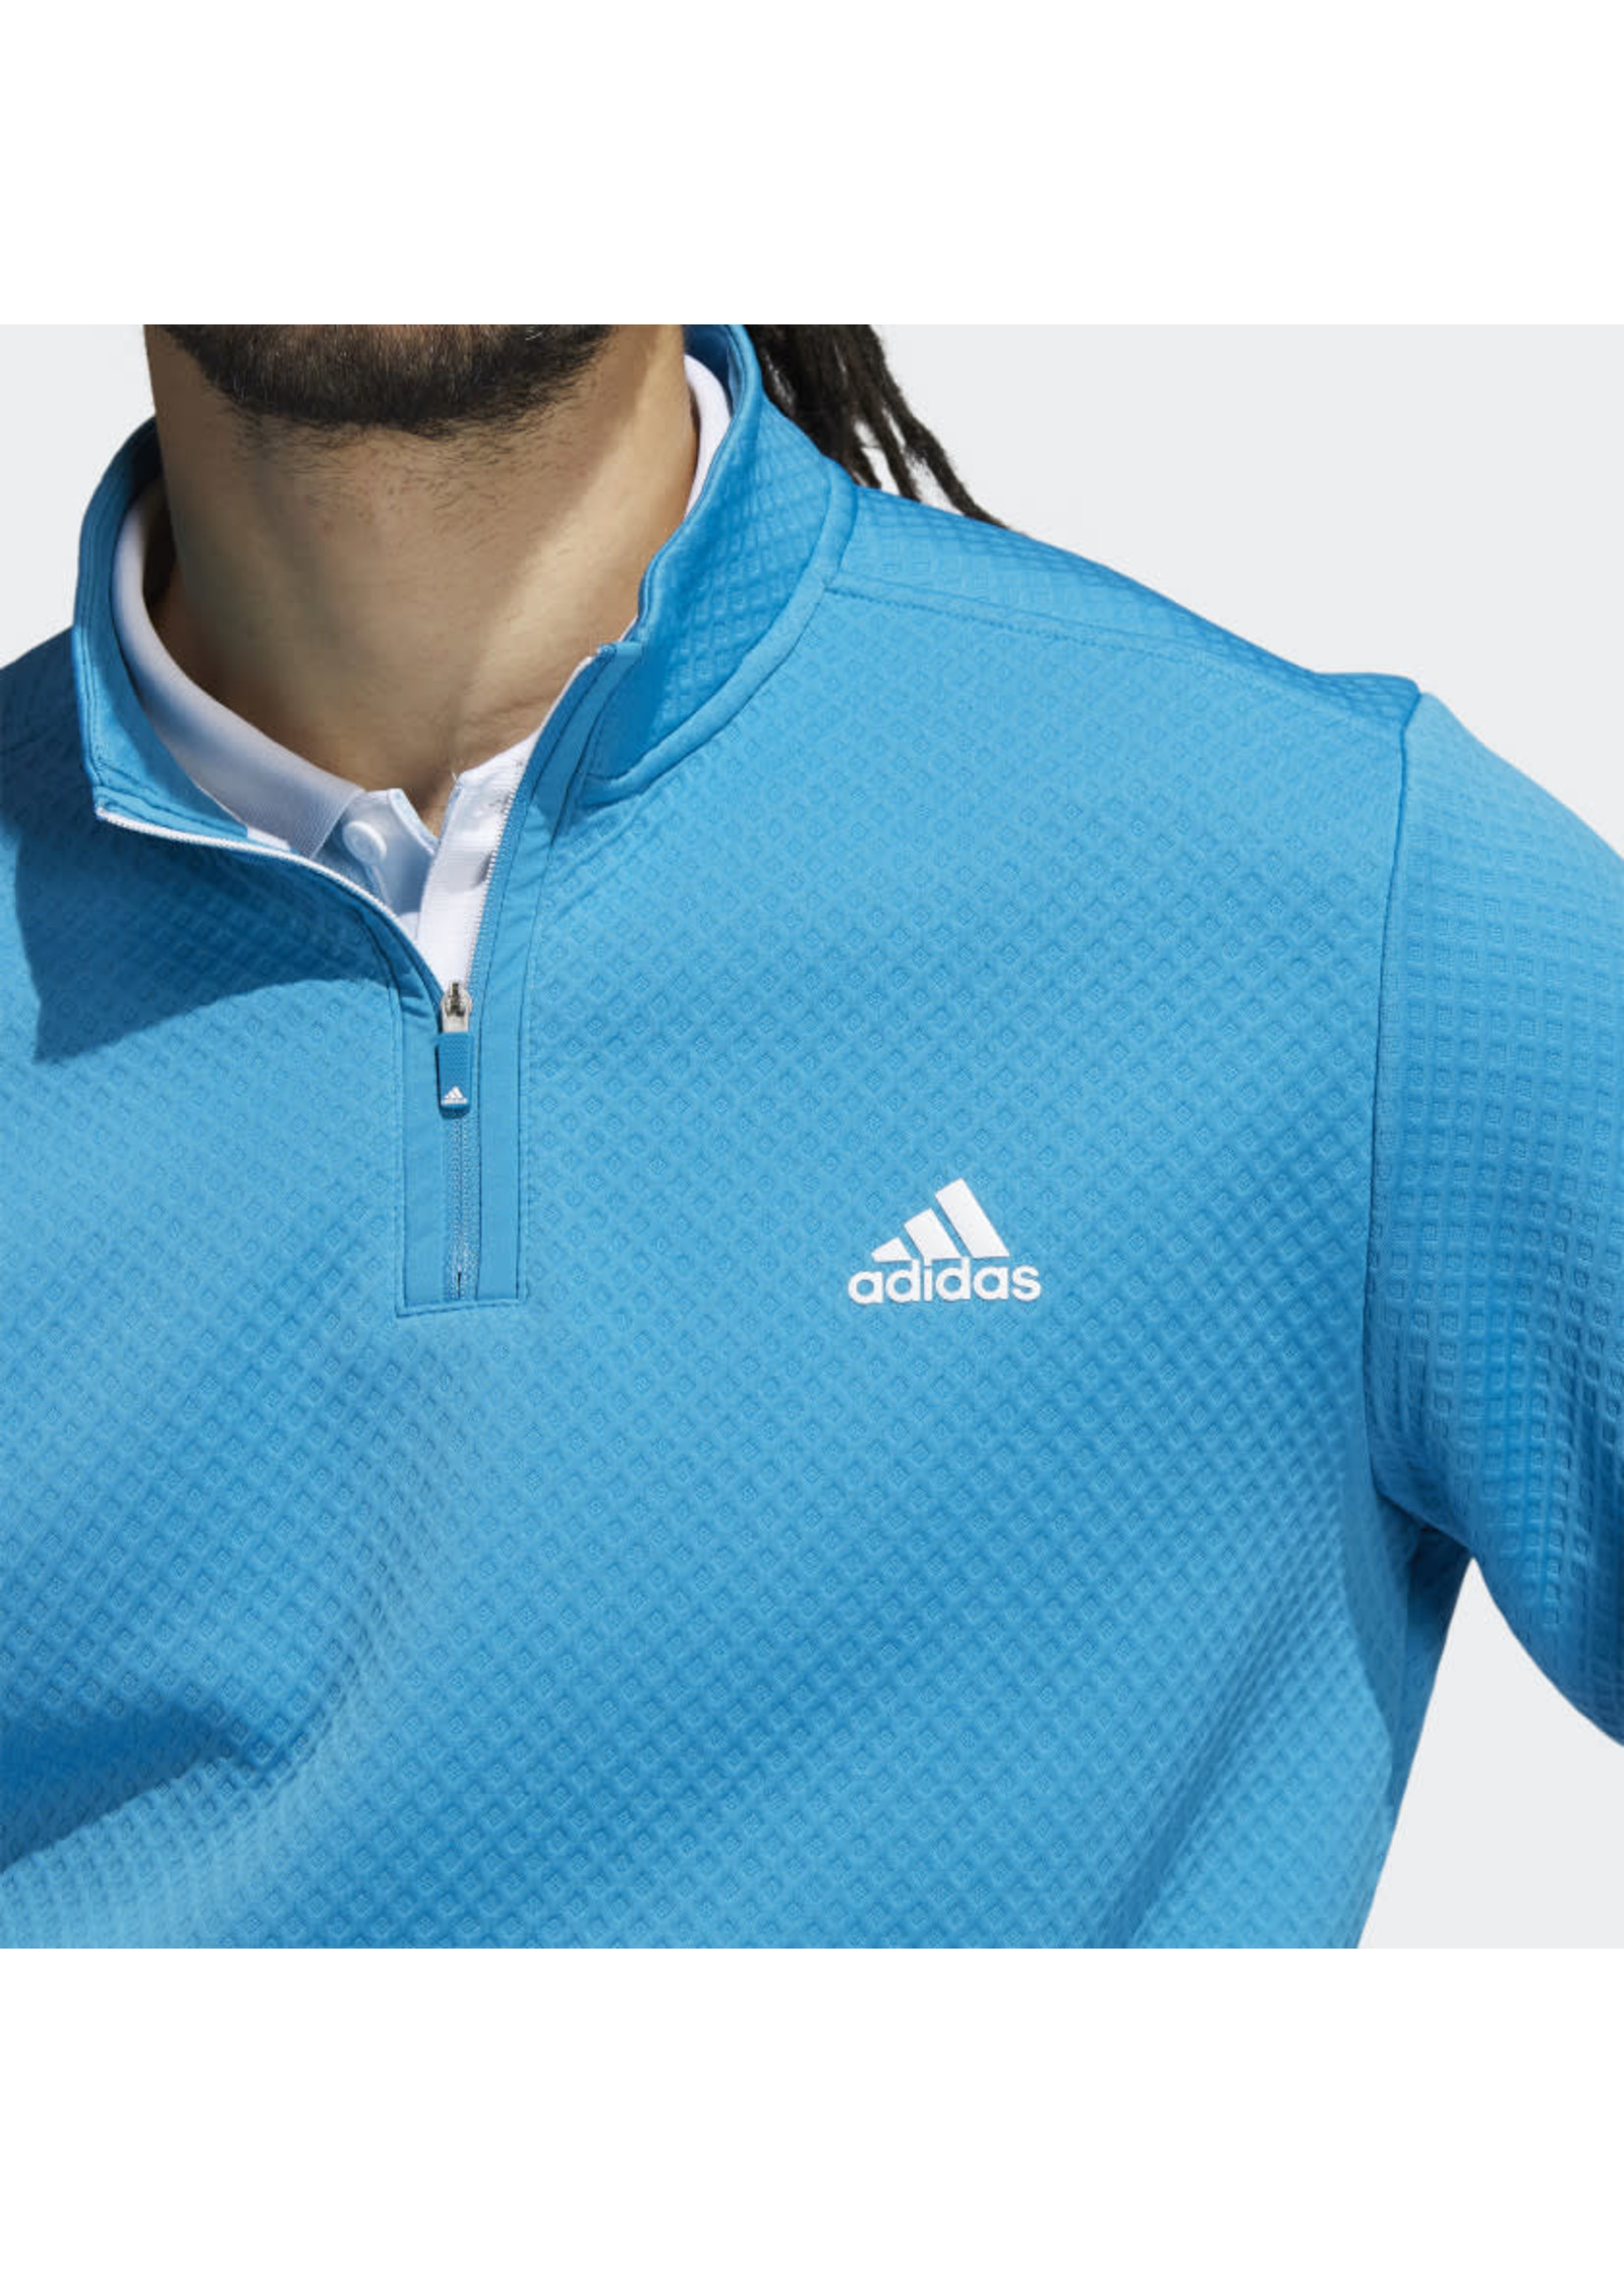 Adidas Adidas Prime Green Water Resistant Mens Golf Top (2021) - Sonic Aqua